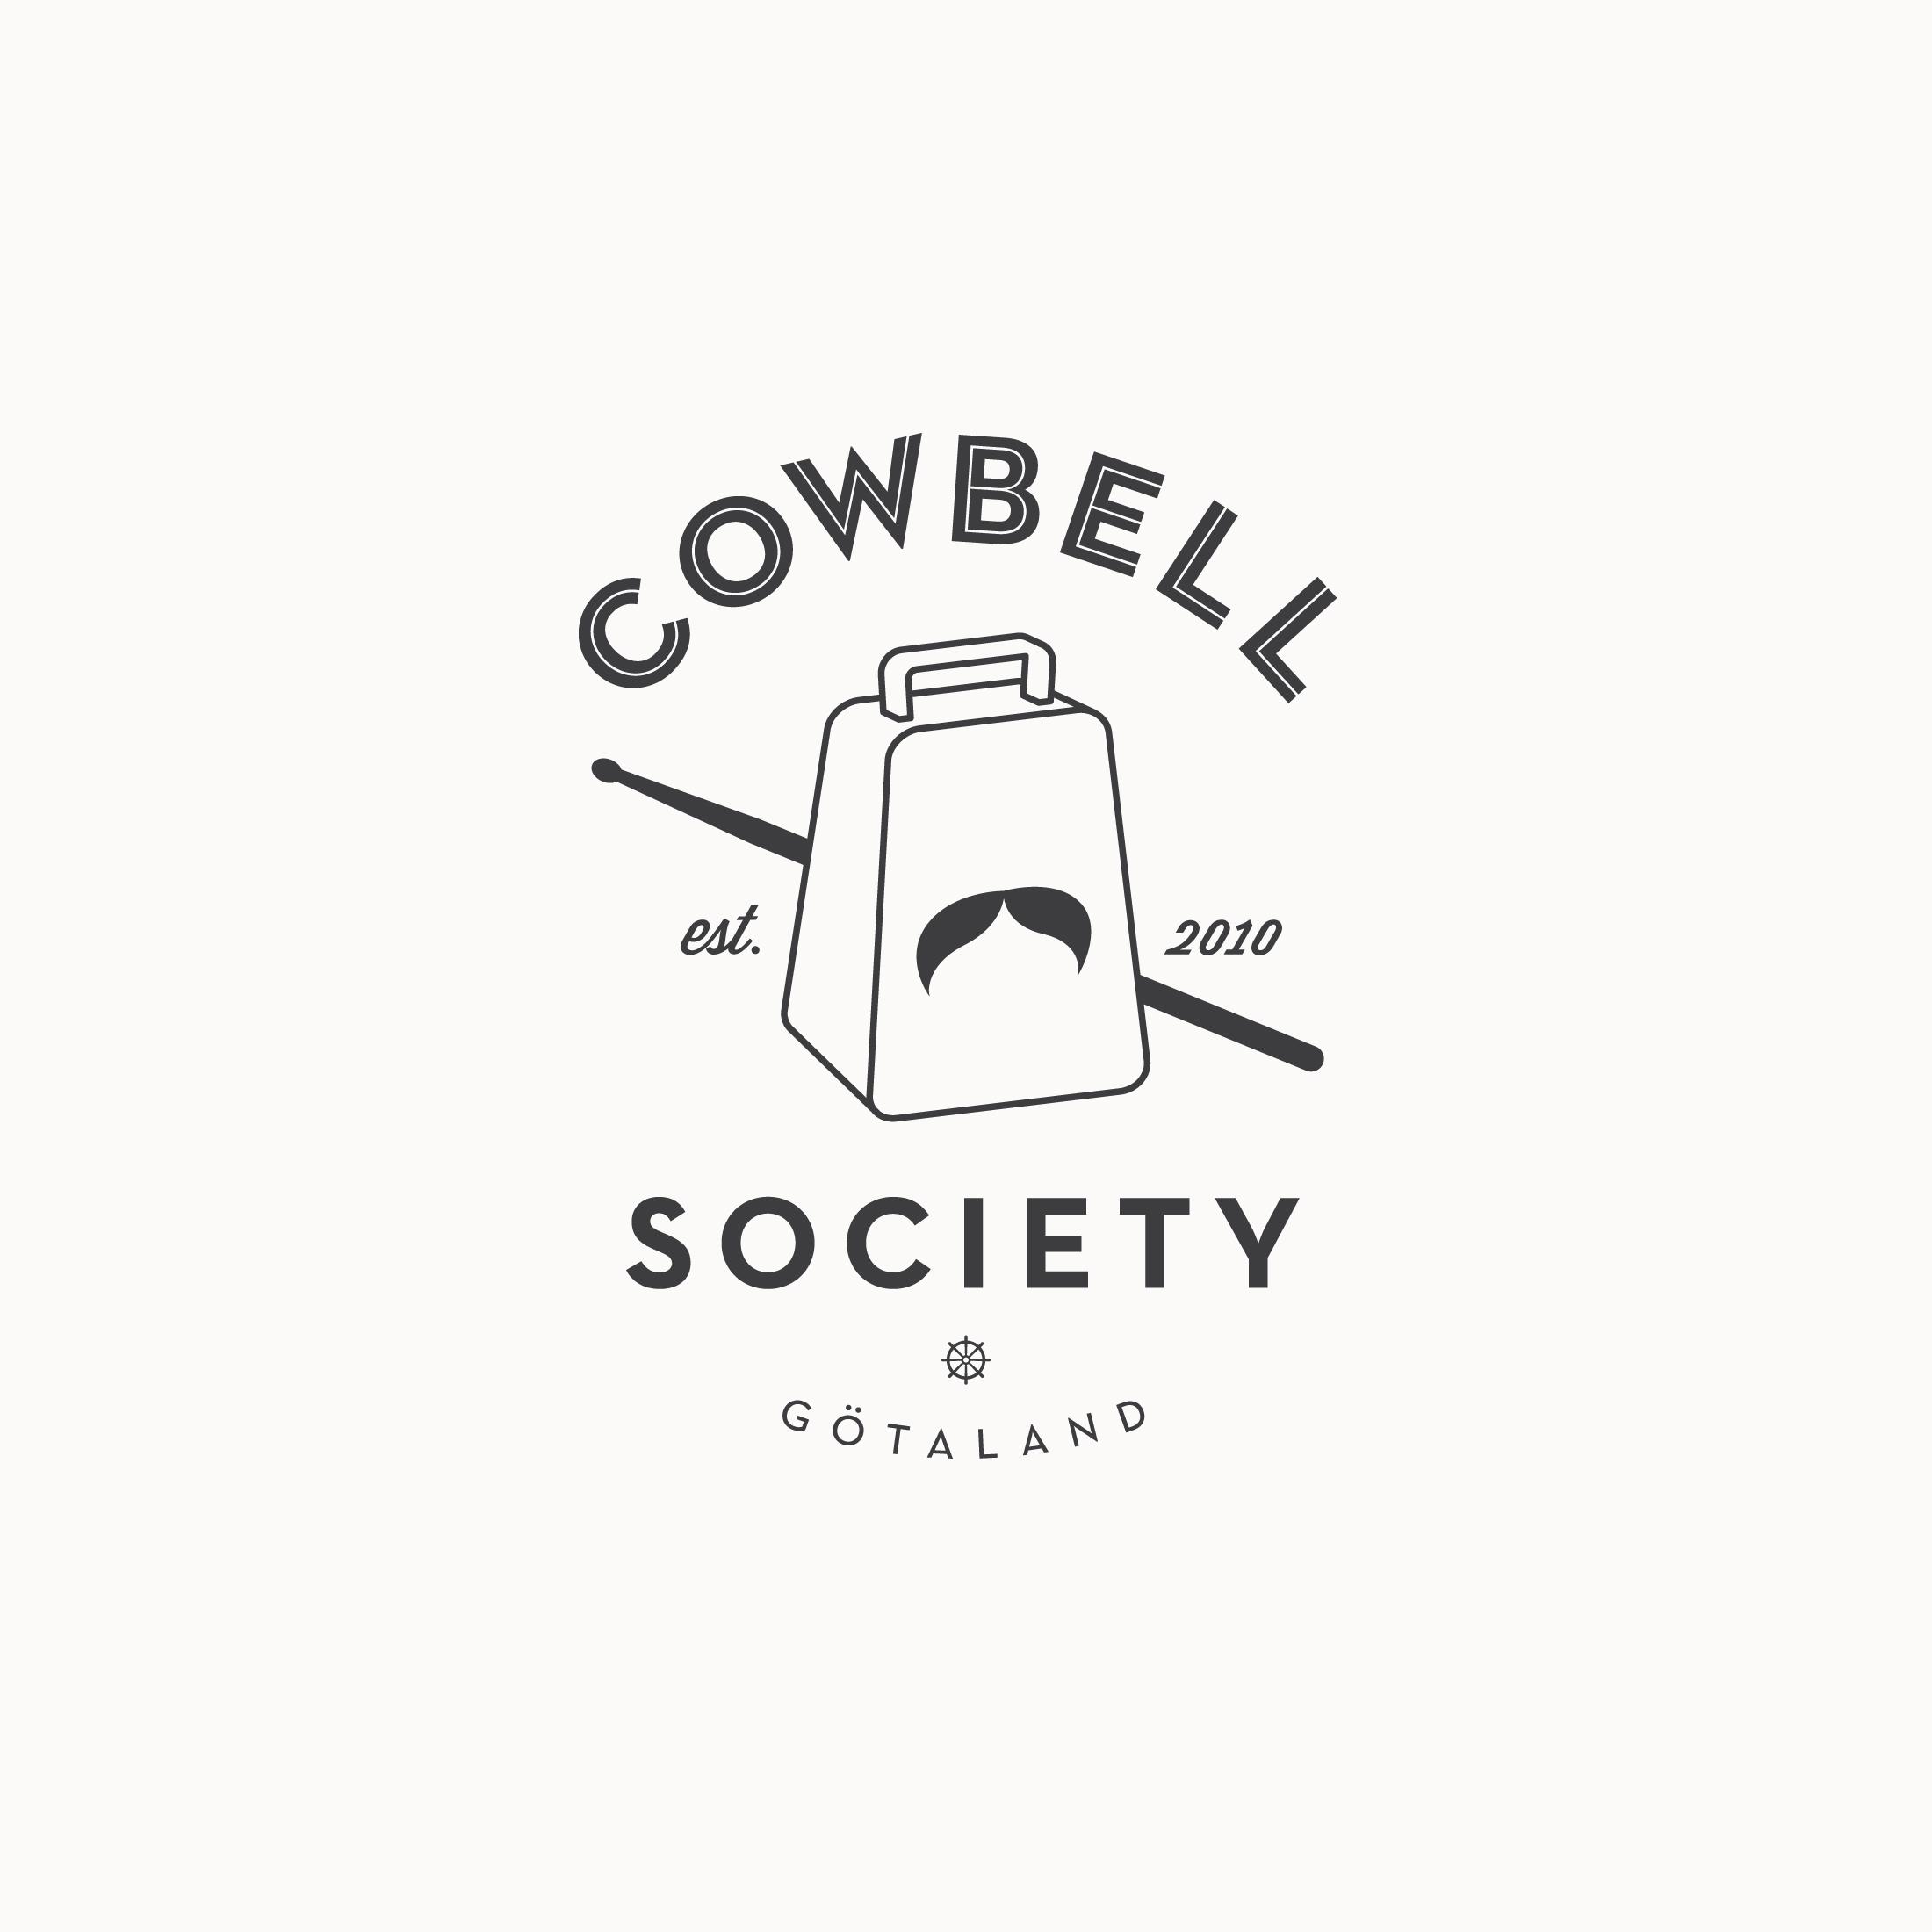 Cowbell Society